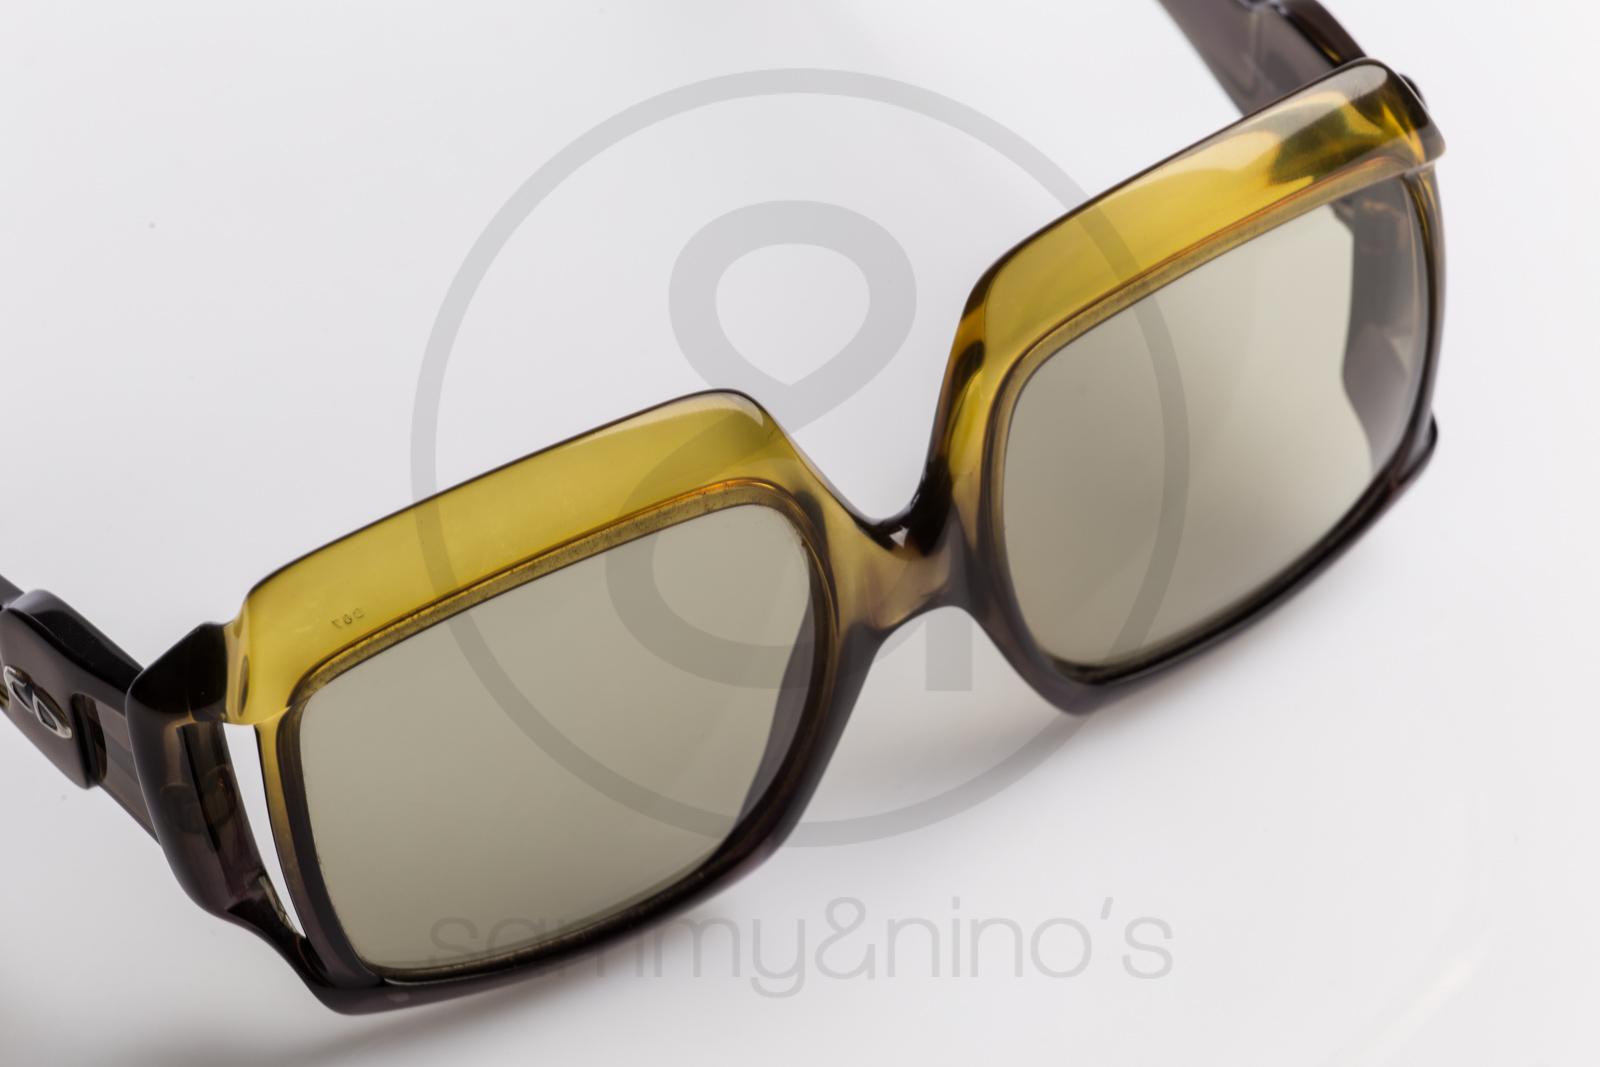 Dior Glasses Frame 2015 : Christian Dior II Sammy & Ninos Store